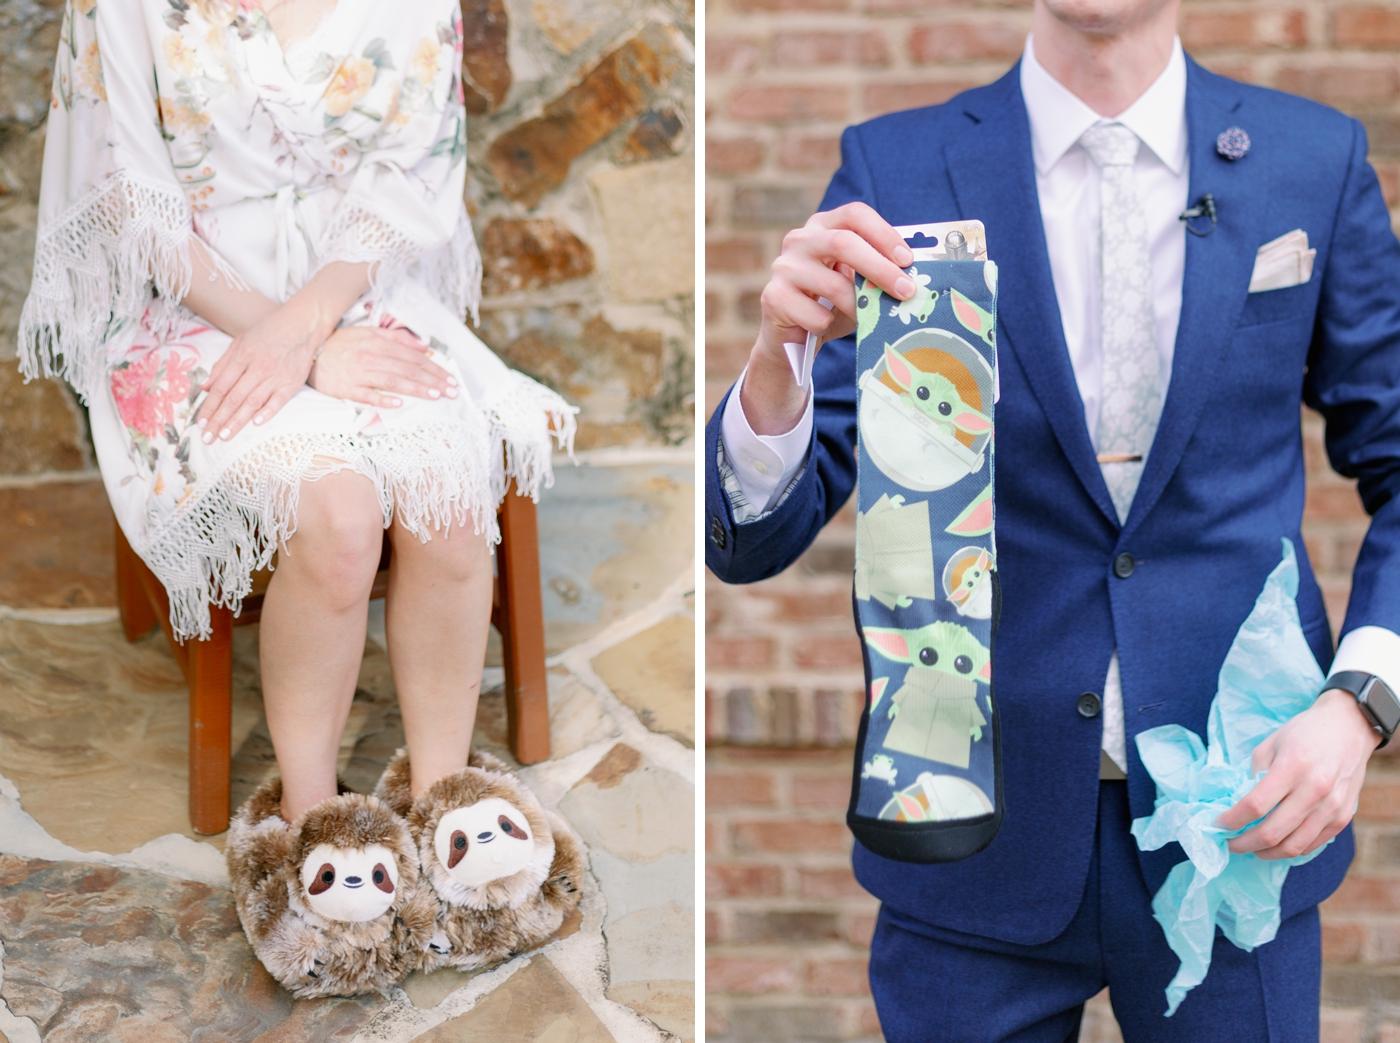 sloth slippers and baby yoda socks